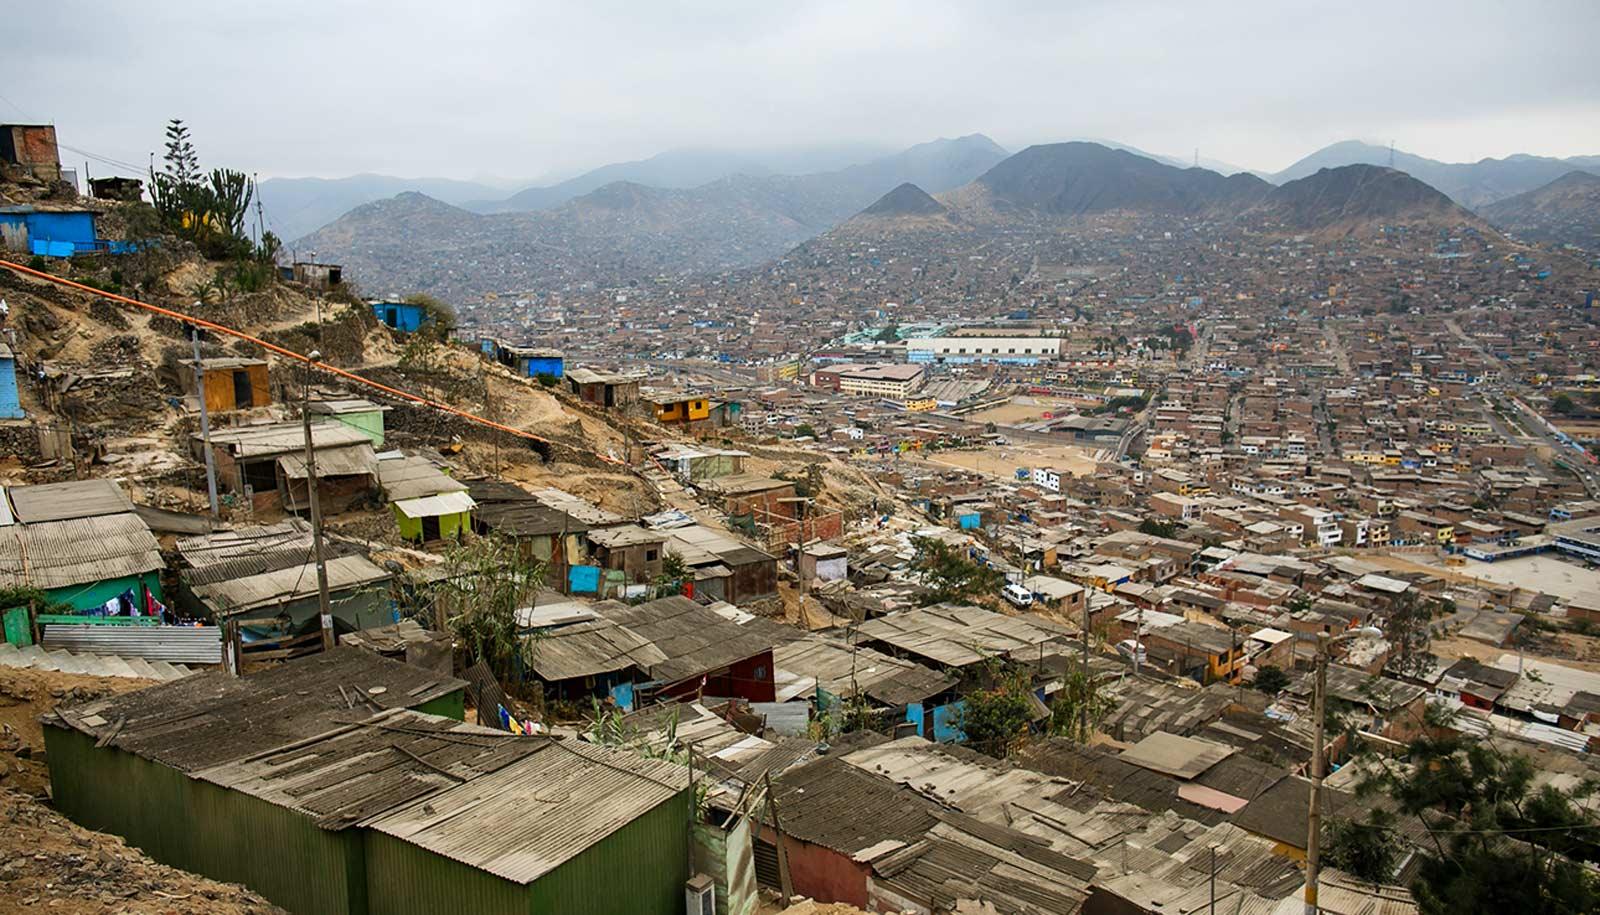 slum outside Lima, Peru